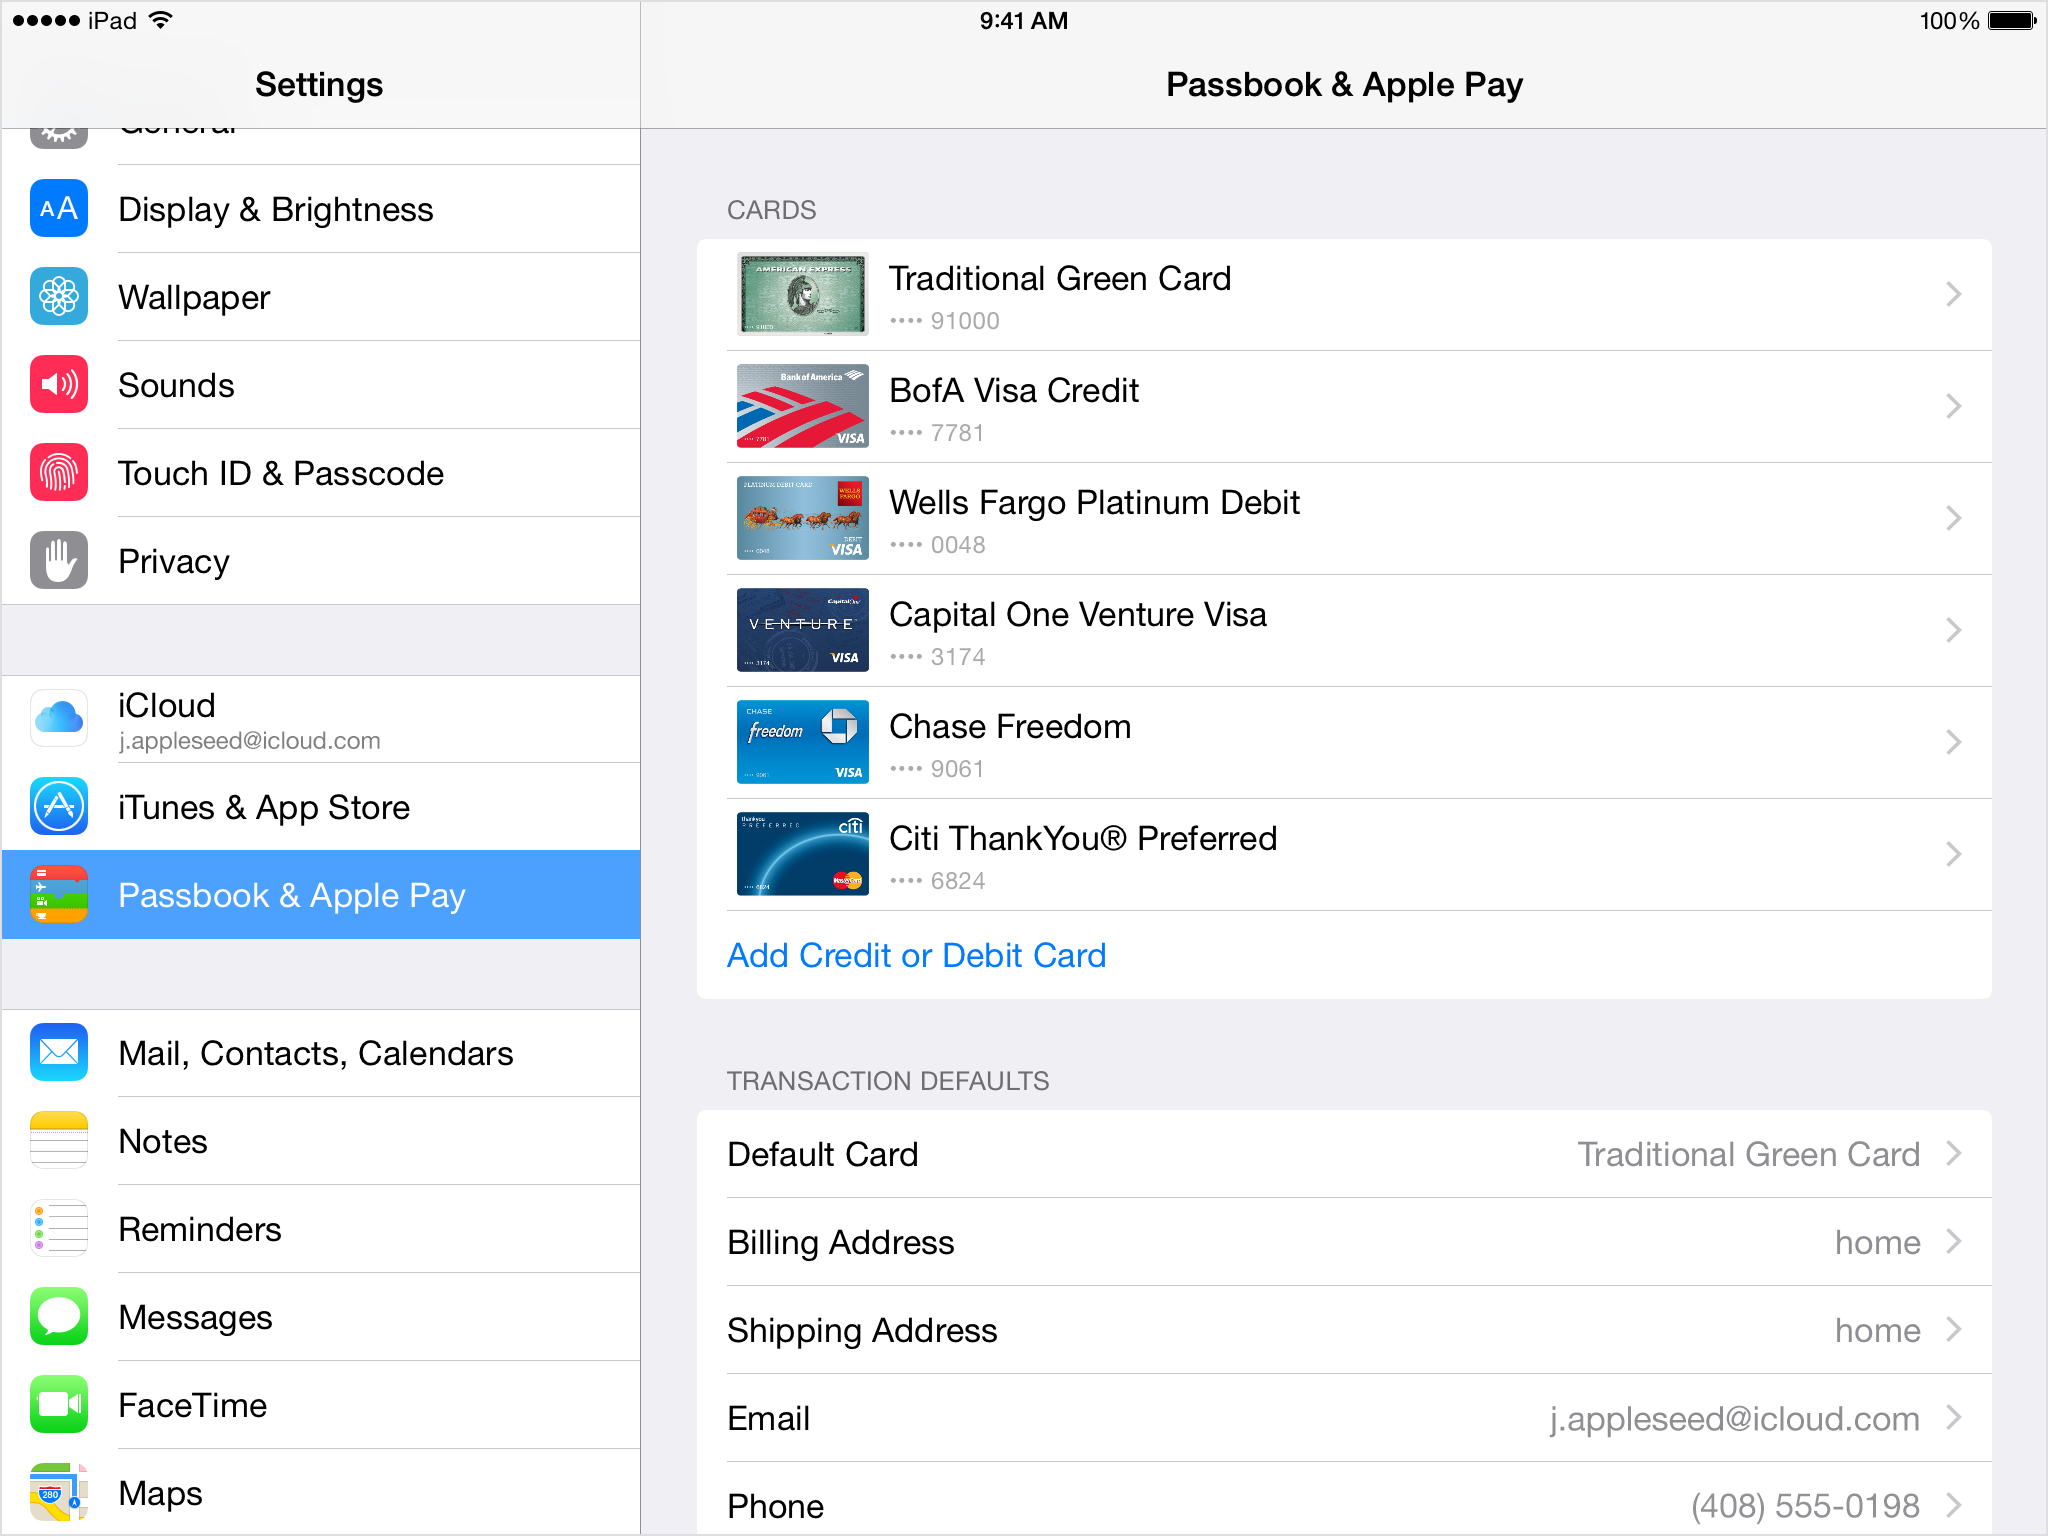 Add Credit or Debit Card in Passbook settings